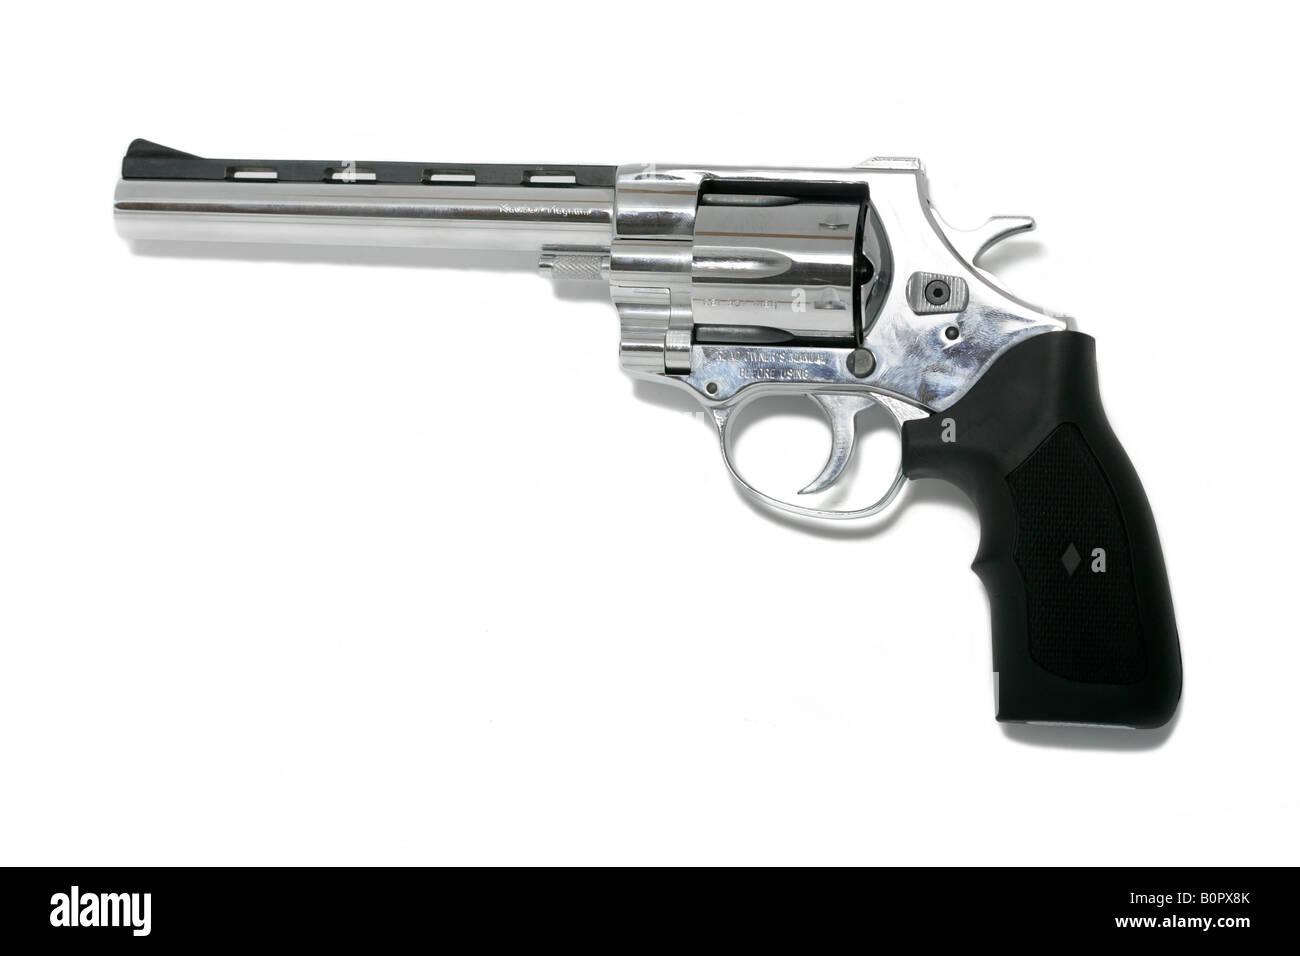 367 Magnum hand gun handgun pistol